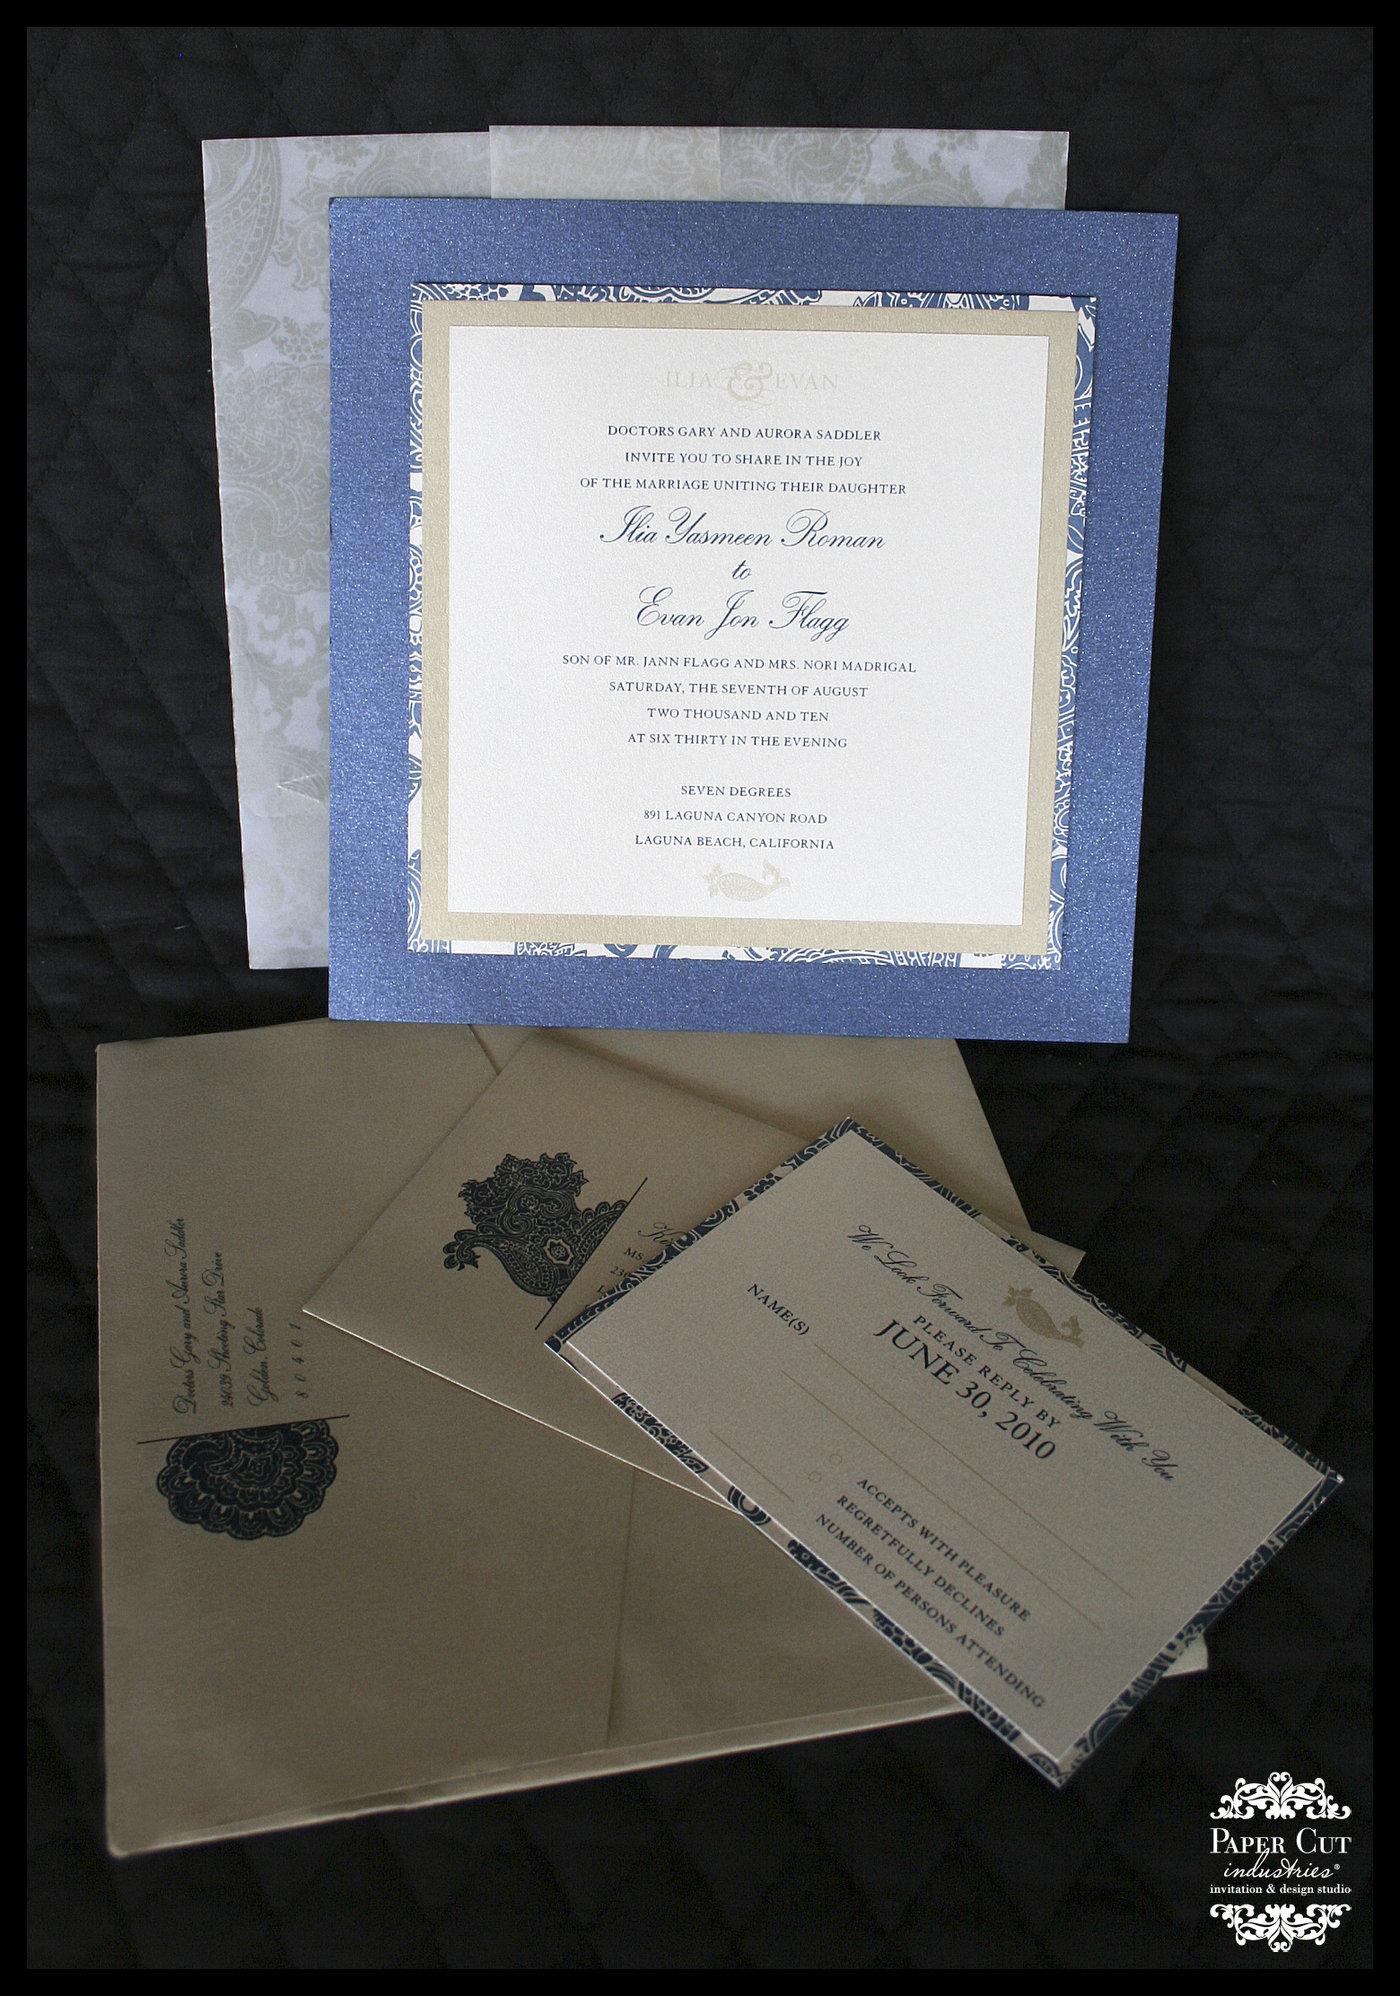 Wedding invitations event invitations by monica garrett at wedding invitations event invitations by monica garrett at coroflot stopboris Images